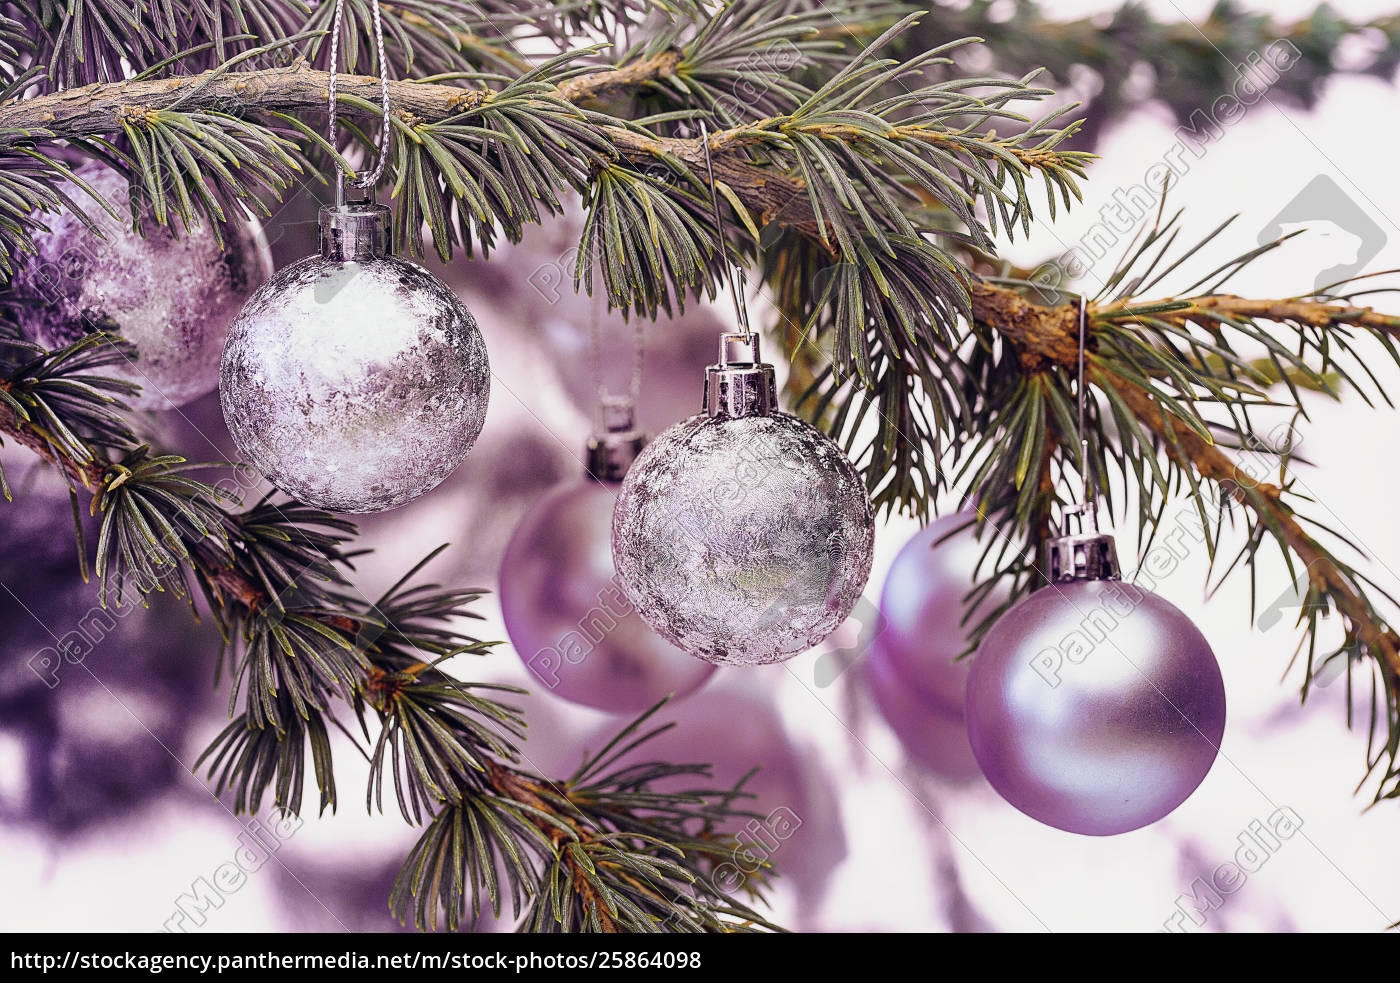 rosa, weihnachtskugeln - 25864098